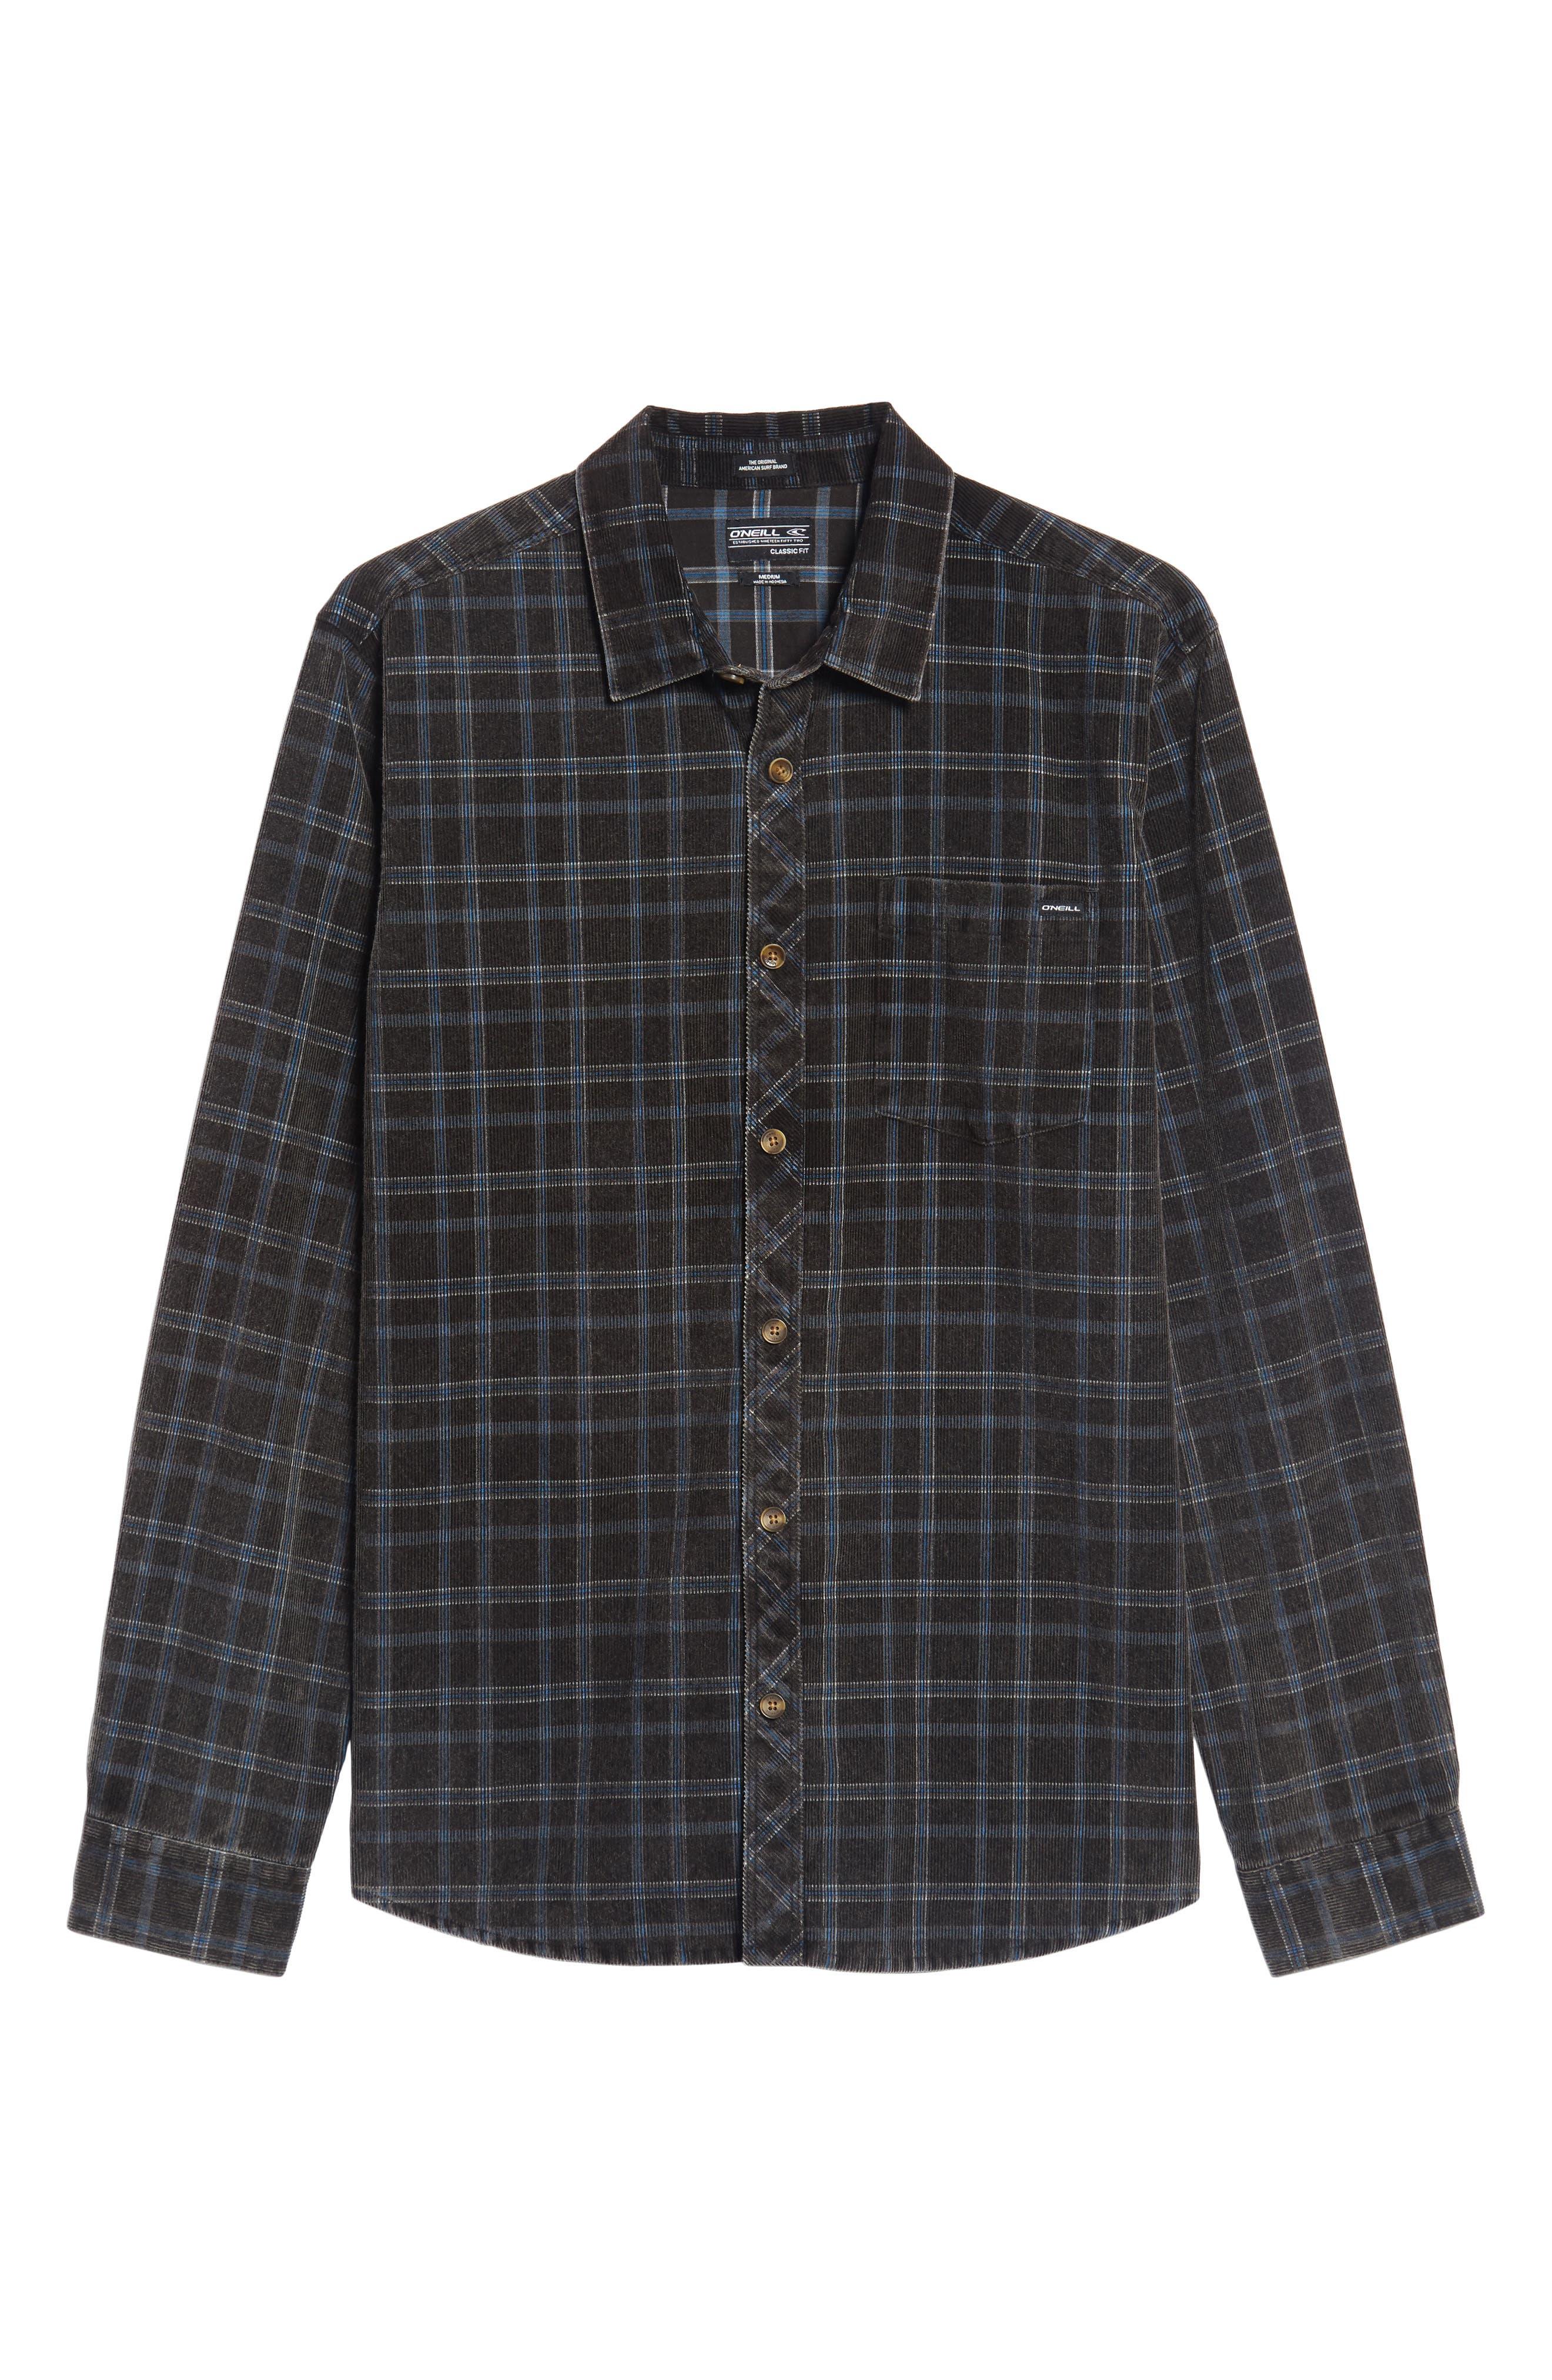 Bradley Corduroy Shirt,                             Alternate thumbnail 6, color,                             001